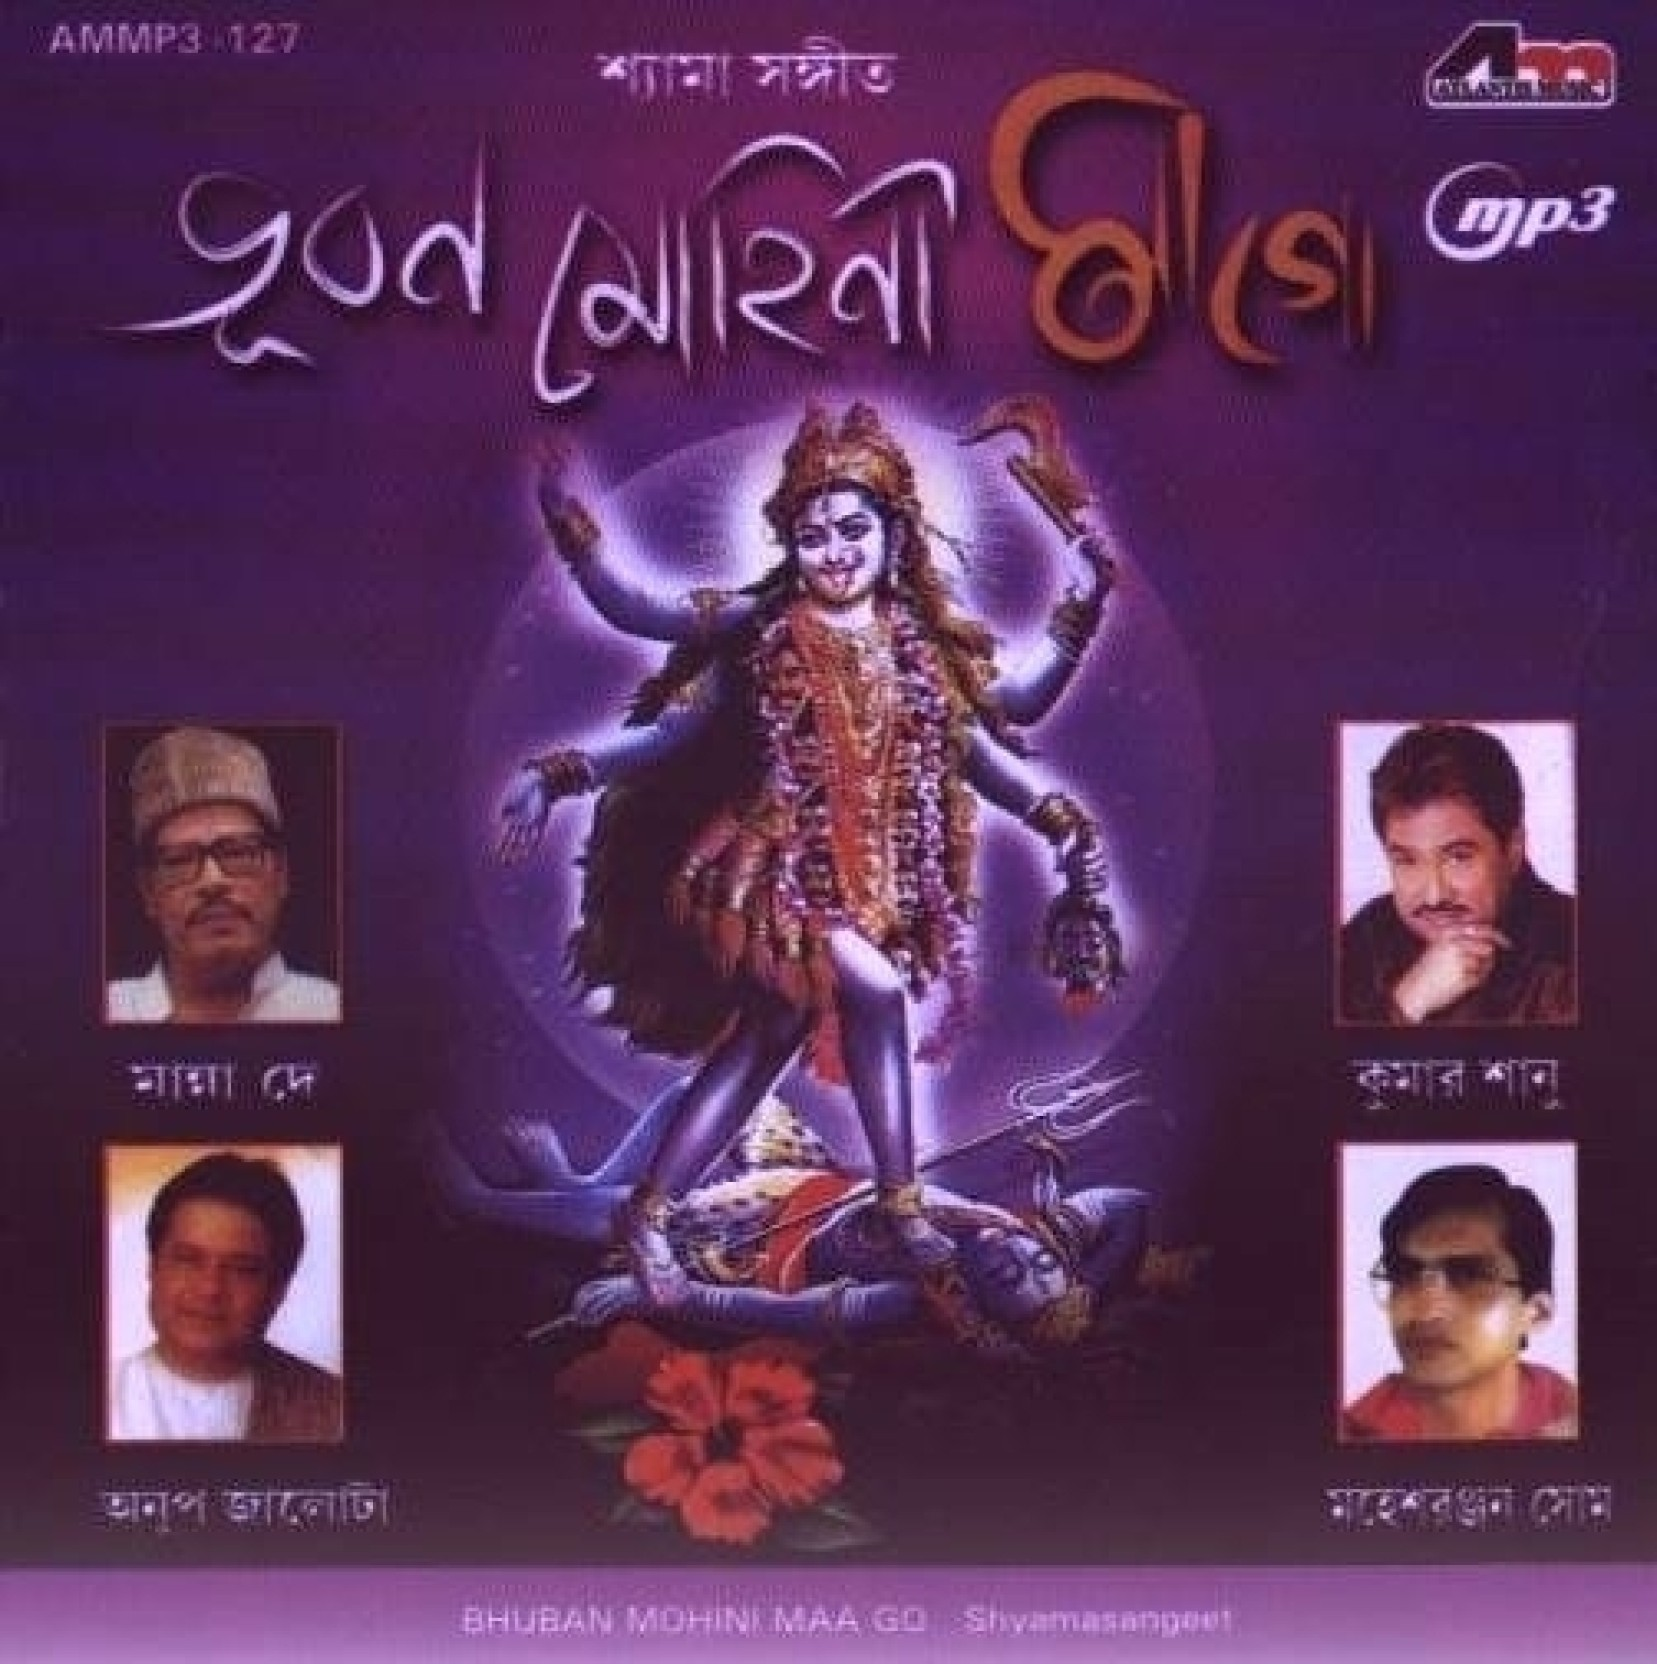 Esechhi Ami Esechhi Manna Dey: Bhuban Mohini Maa Go Music MP3